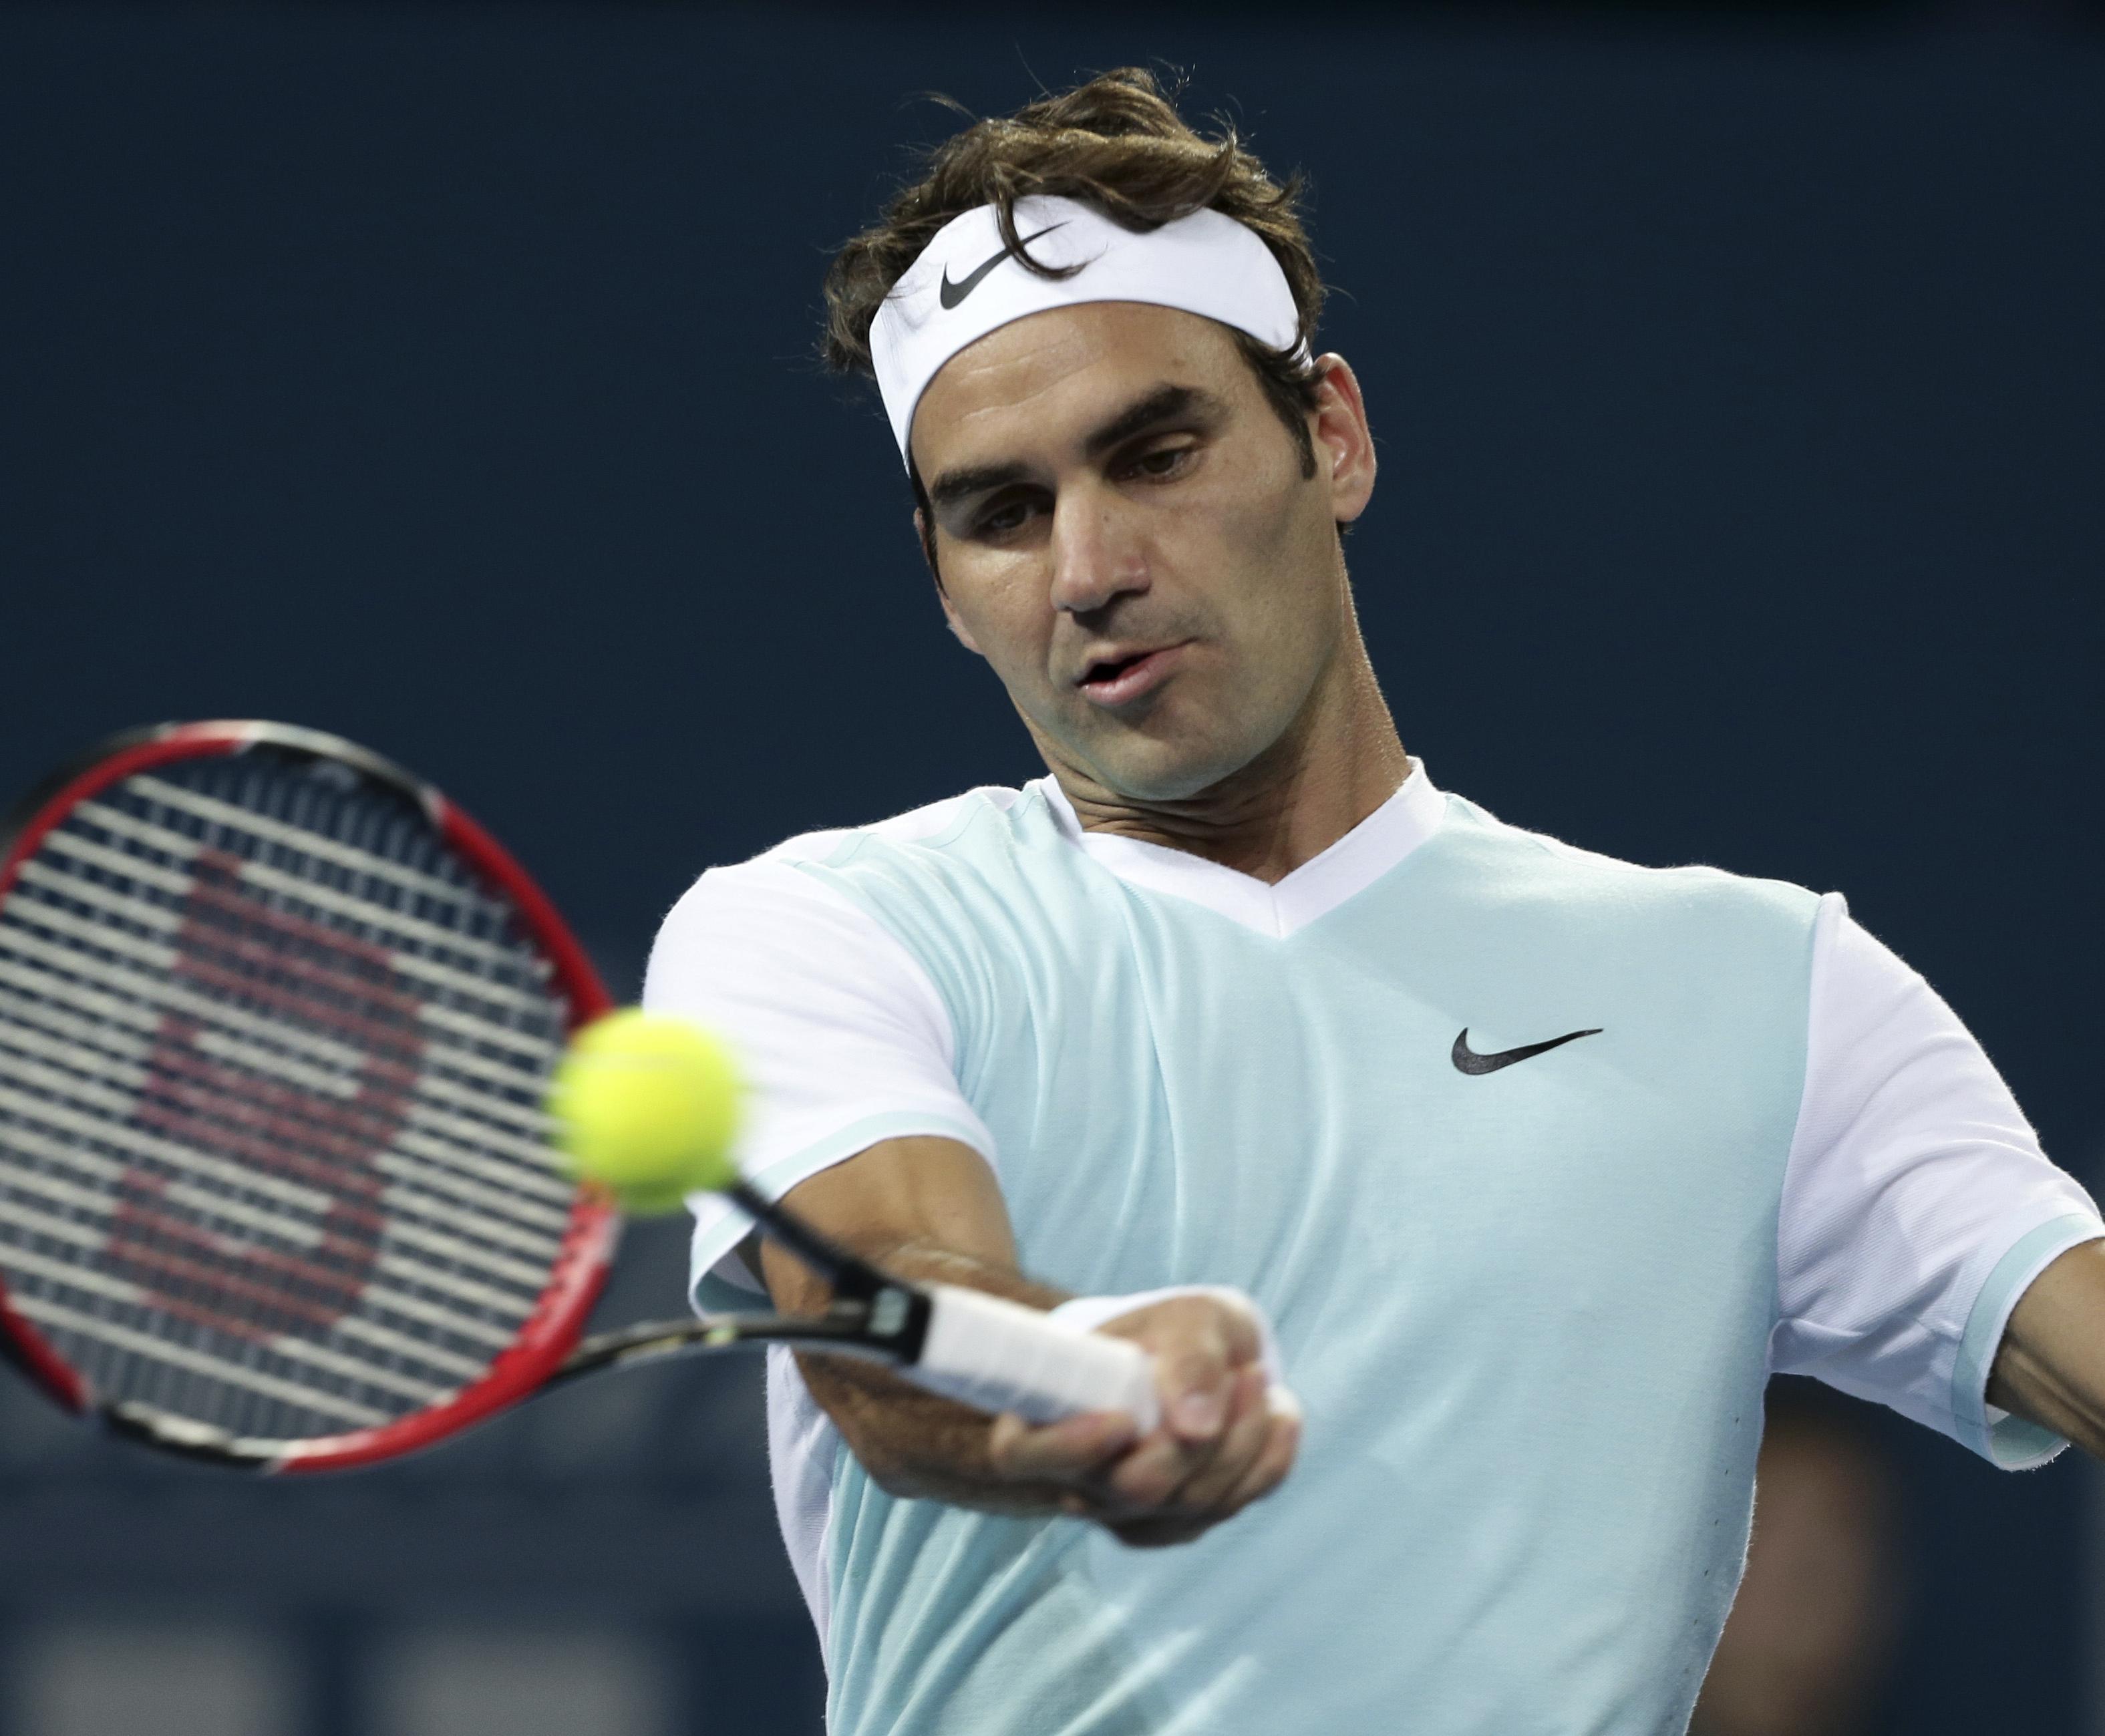 Roger Federer of Switzerland plays a shot in his quarterfinal game against Grigor Dimitrov of Bulgaria during the Brisbane International tennis tournament in Brisbane, Australia, Friday, January 8, 2016. Photo: AP